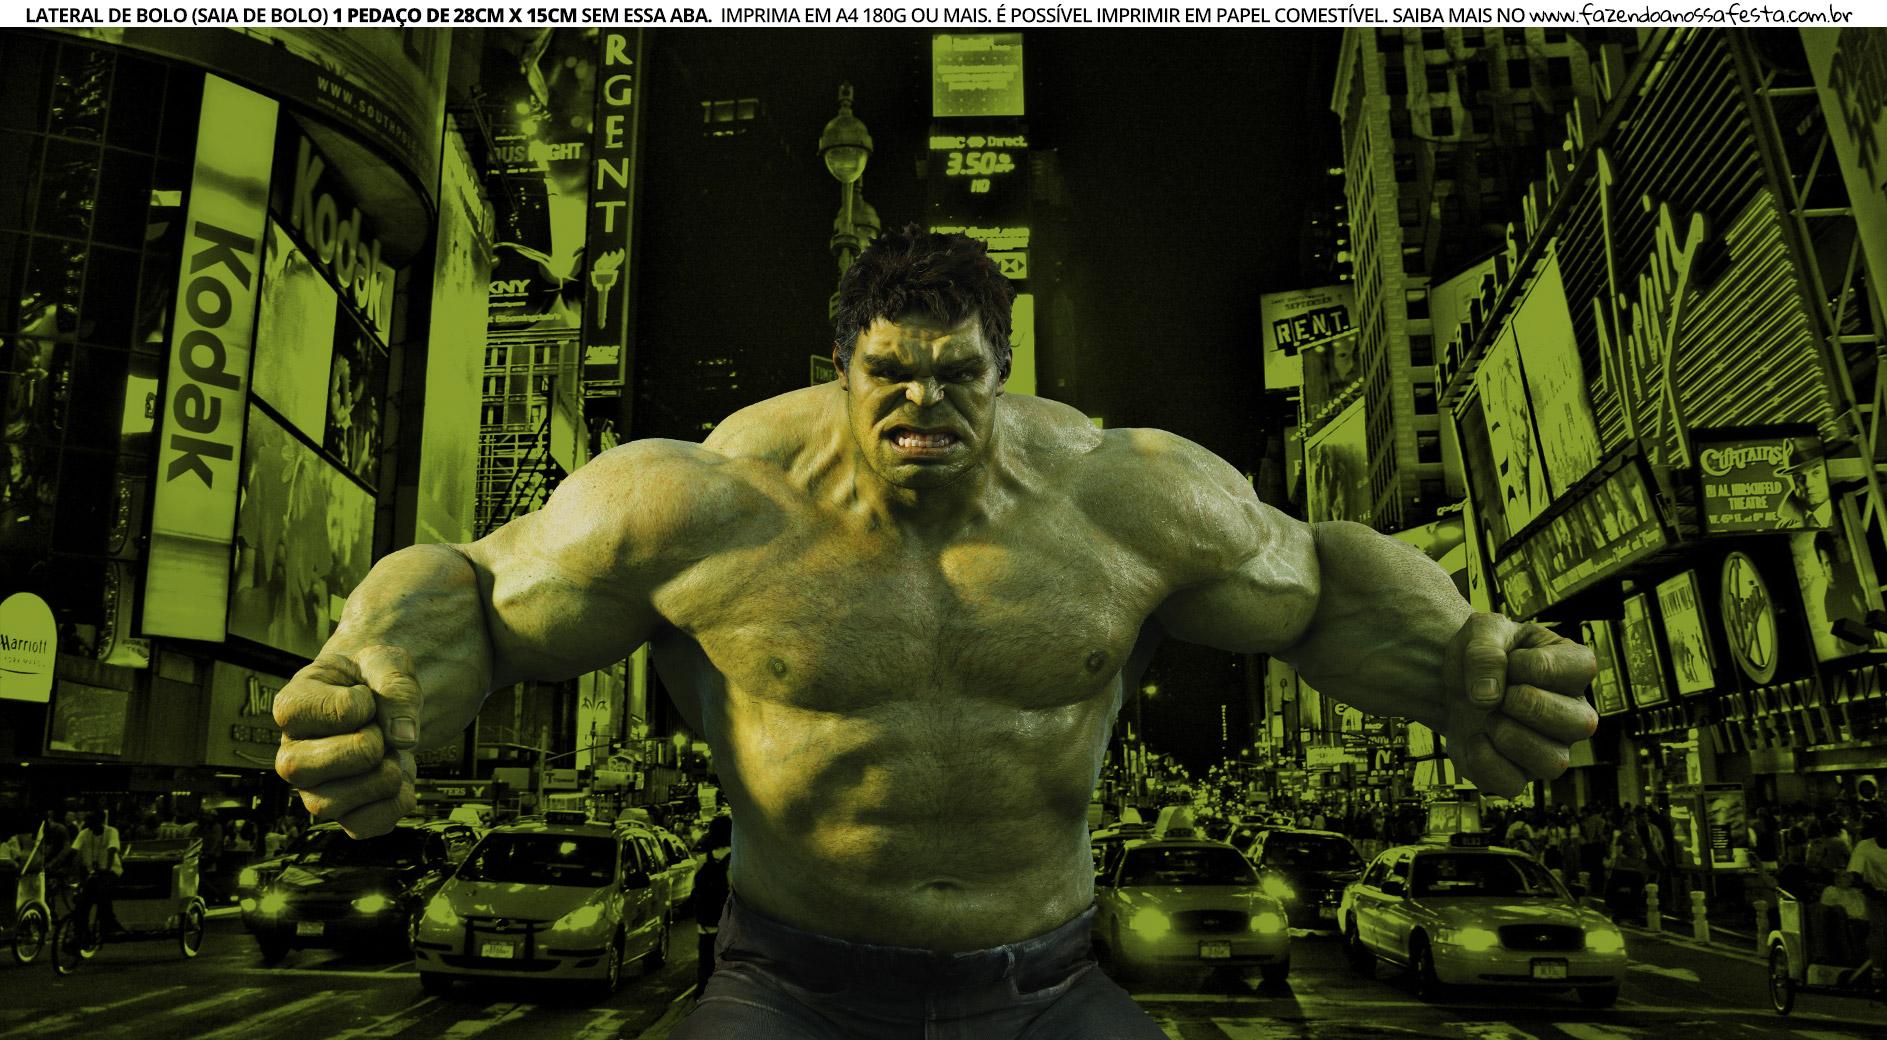 Faixa Lateral para Bolo Hulk 3